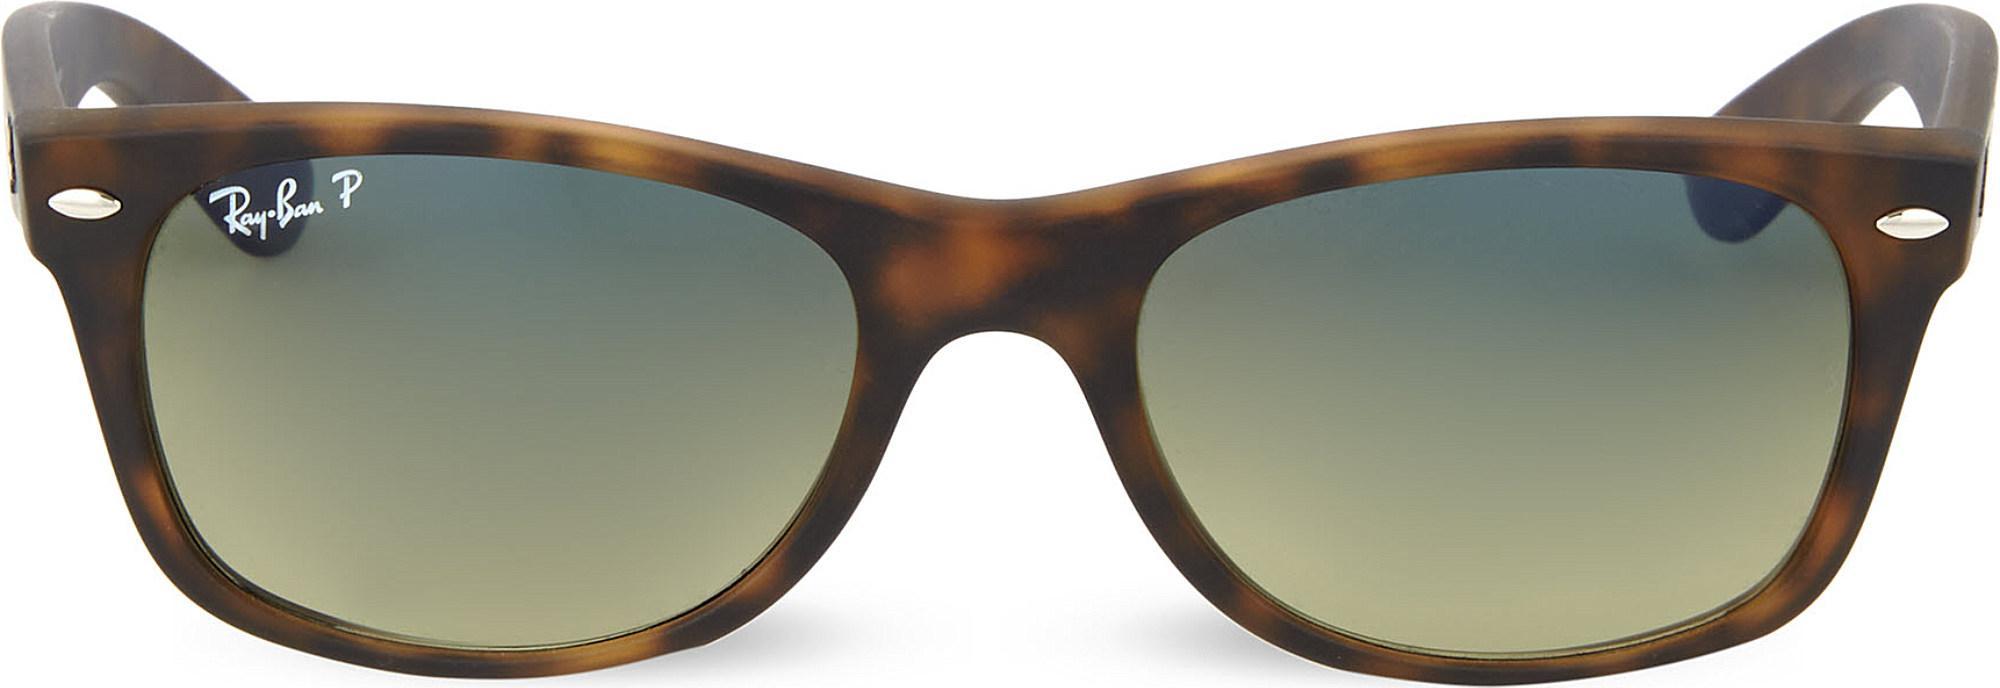 ec49c190329 Ray-Ban. Women s Brown Tortoiseshell Matte Finish Wayfarer Sunglasses ...